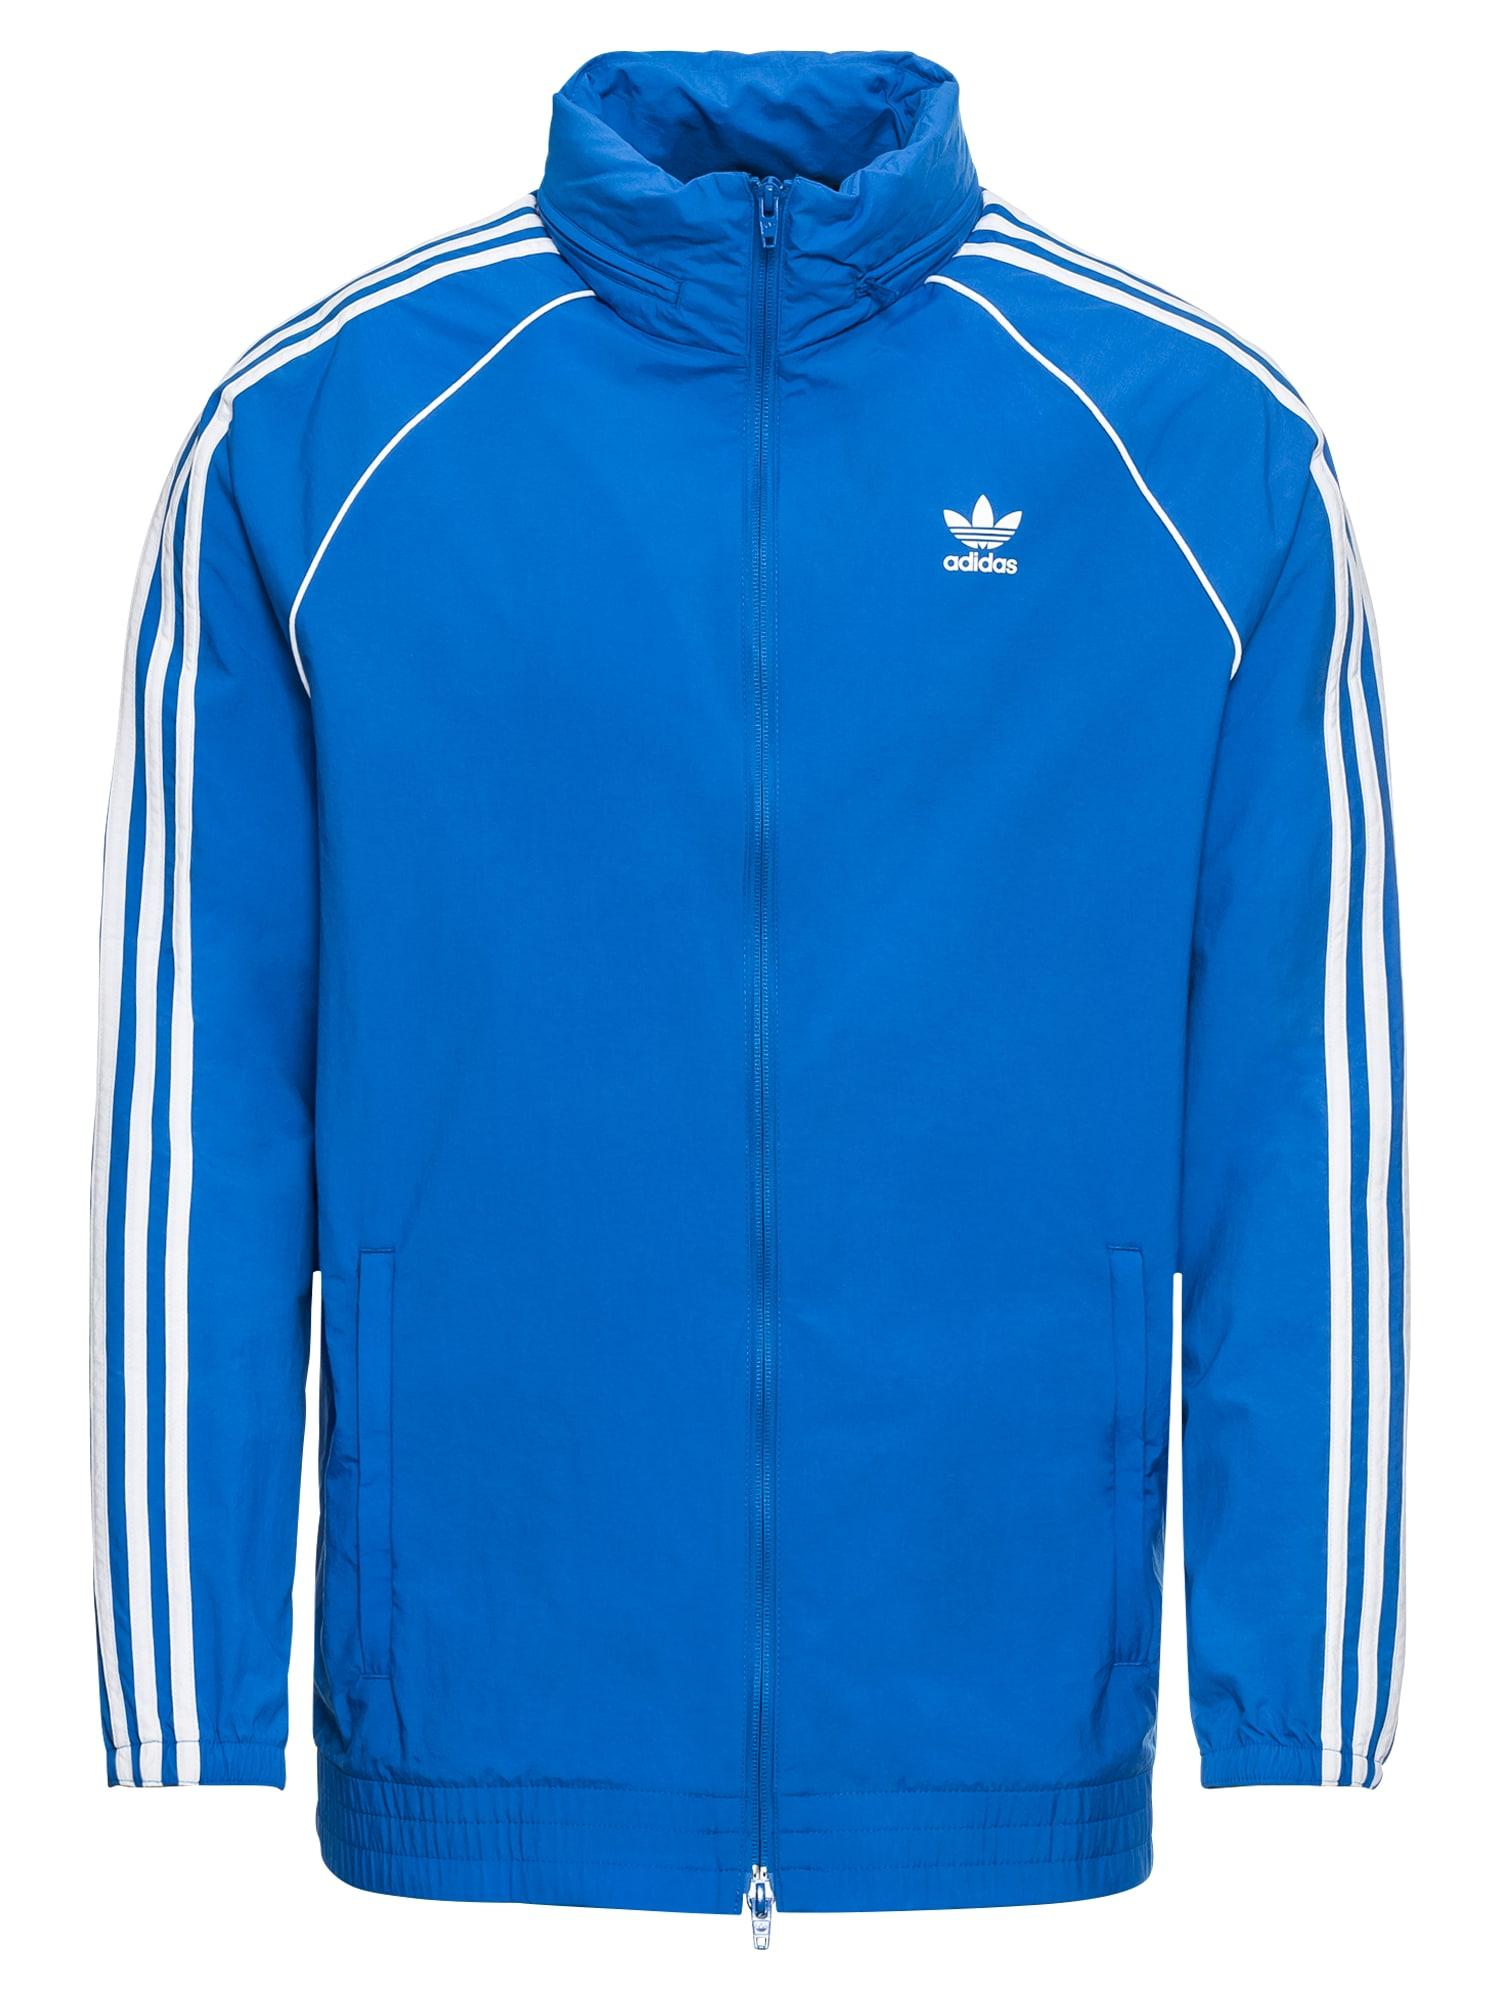 Přechodná bunda SST WINDBREAKER modrá bílá ADIDAS ORIGINALS